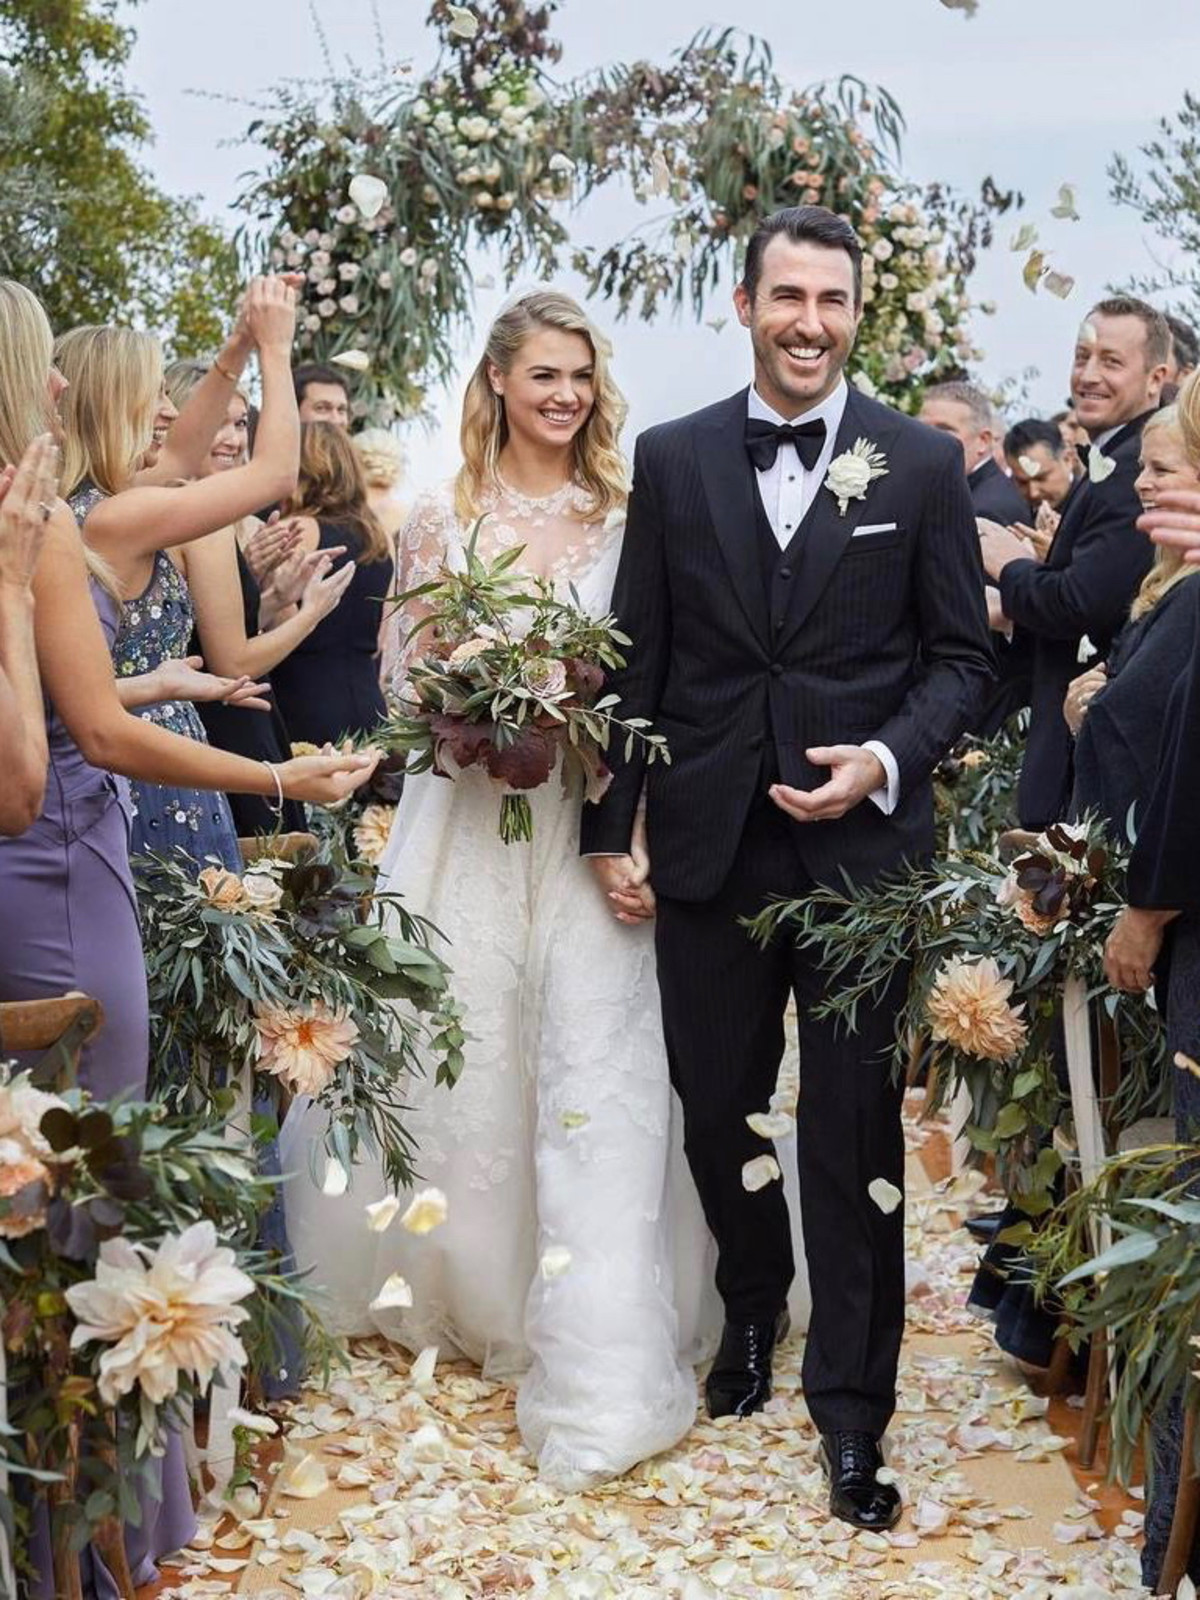 Kate Upton Justin Verlander wedding photo